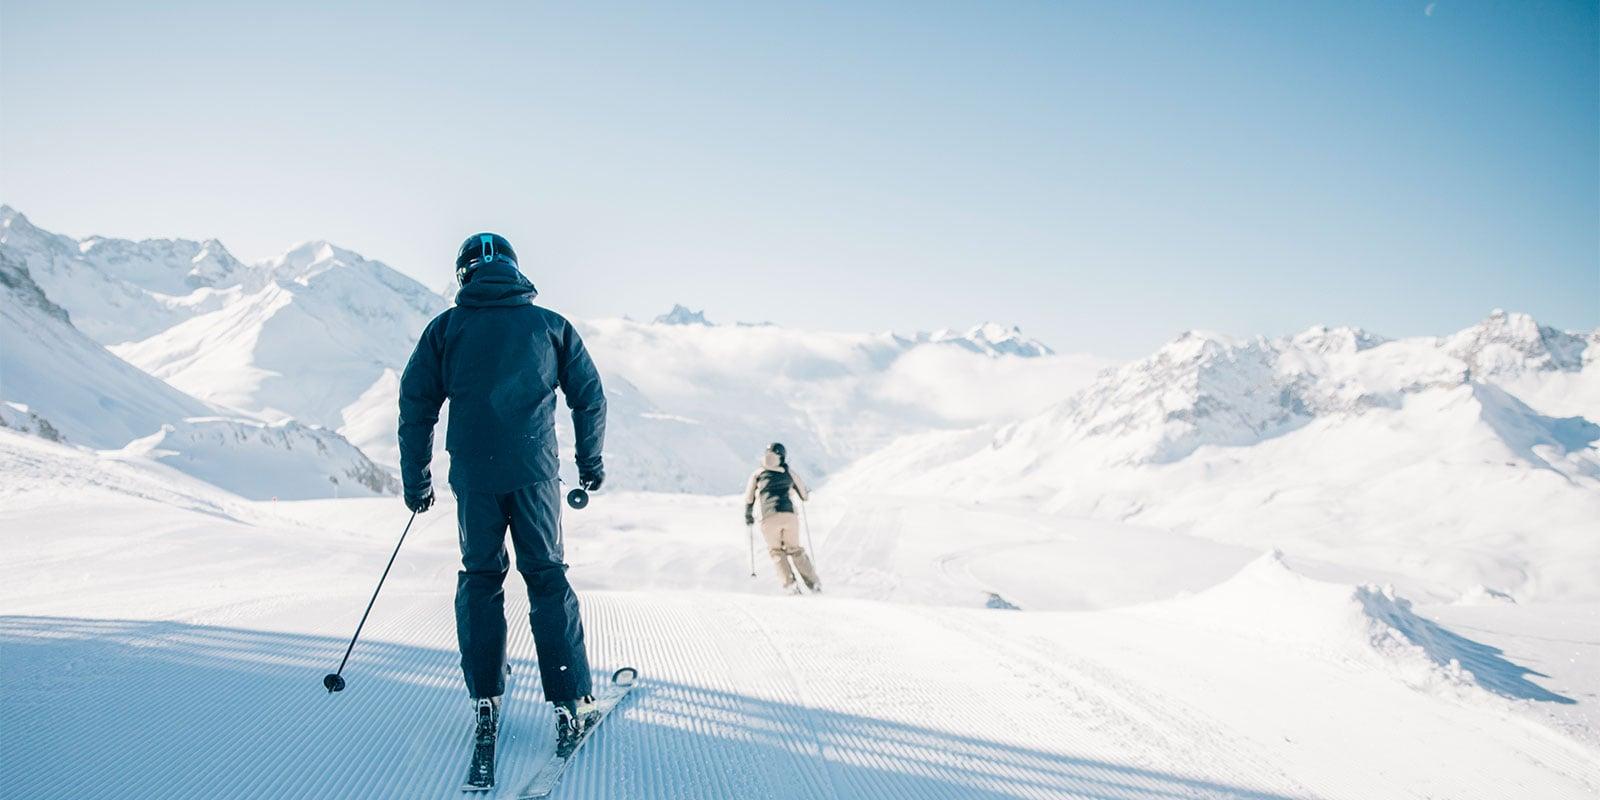 skifahren-titelbild3-daniel-zangerl-lech-zuers-tourismus